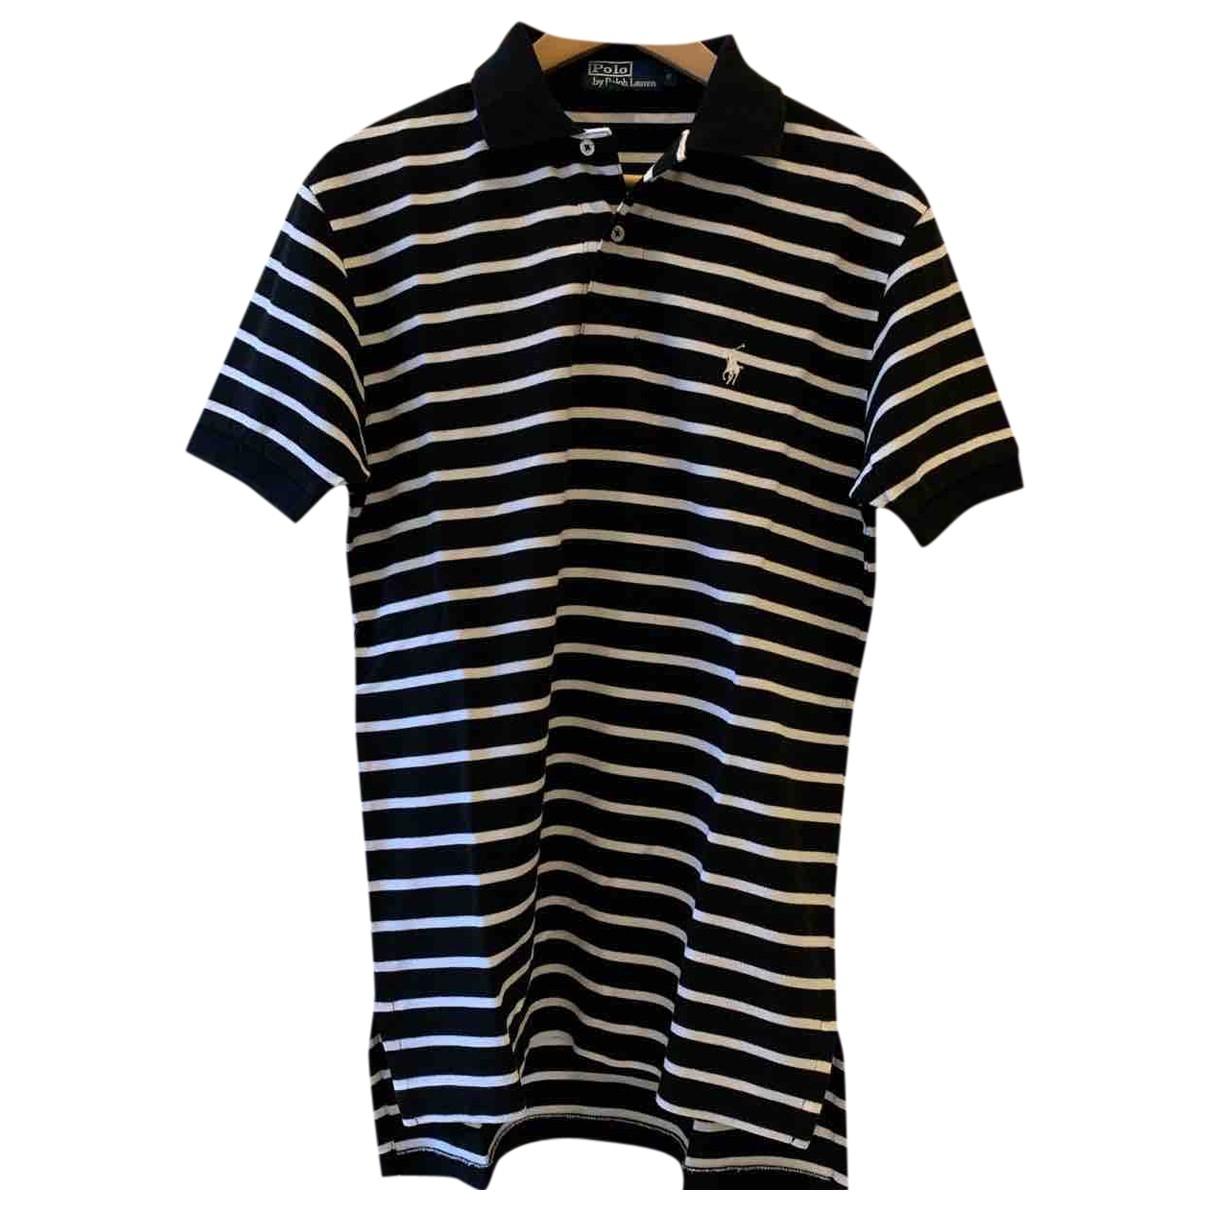 Polo Ralph Lauren - Polos   pour homme en coton - noir